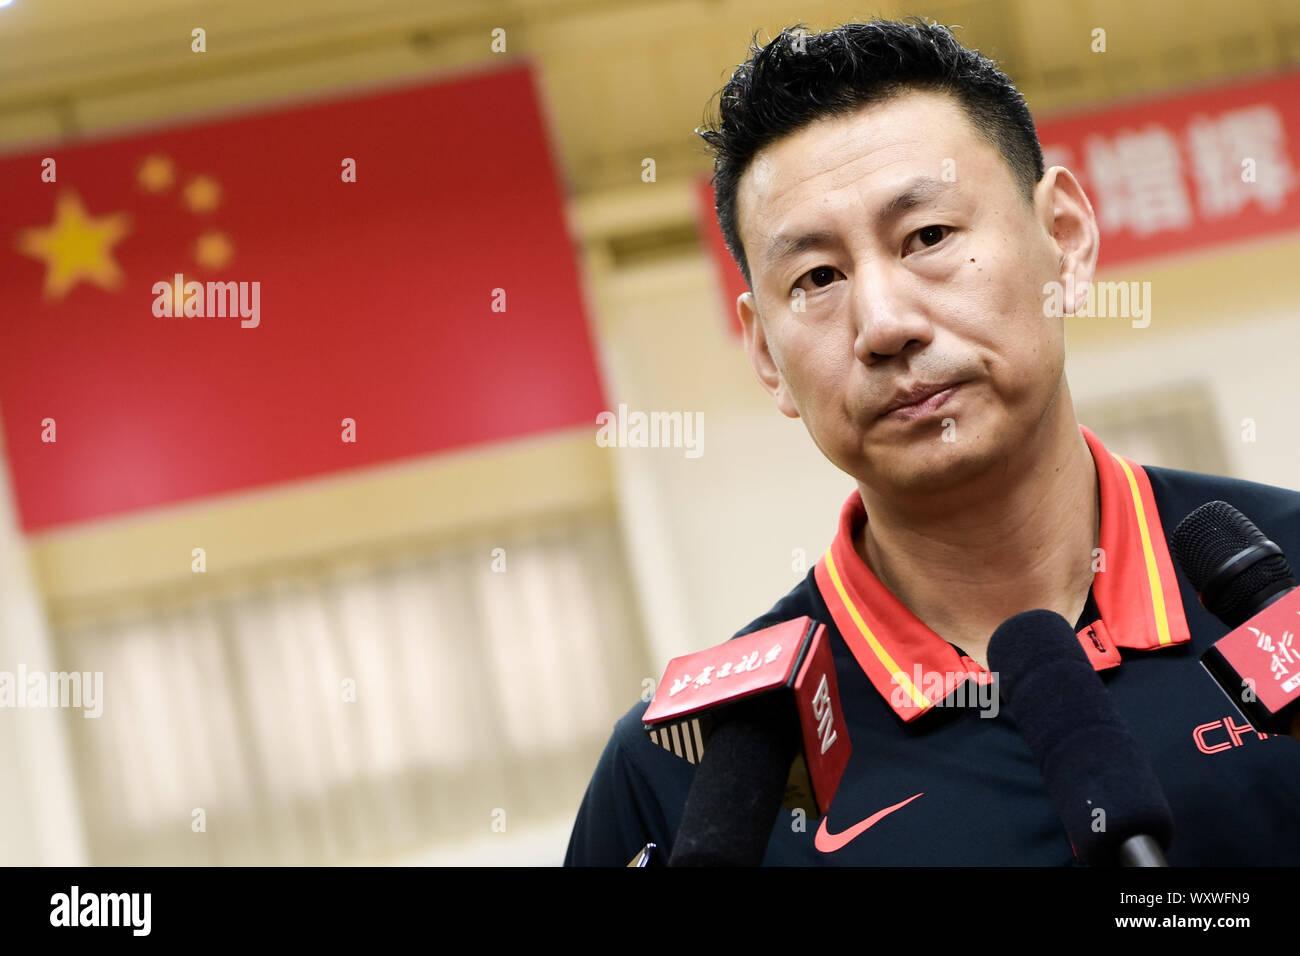 Vancouver maire datant chanteur chinois